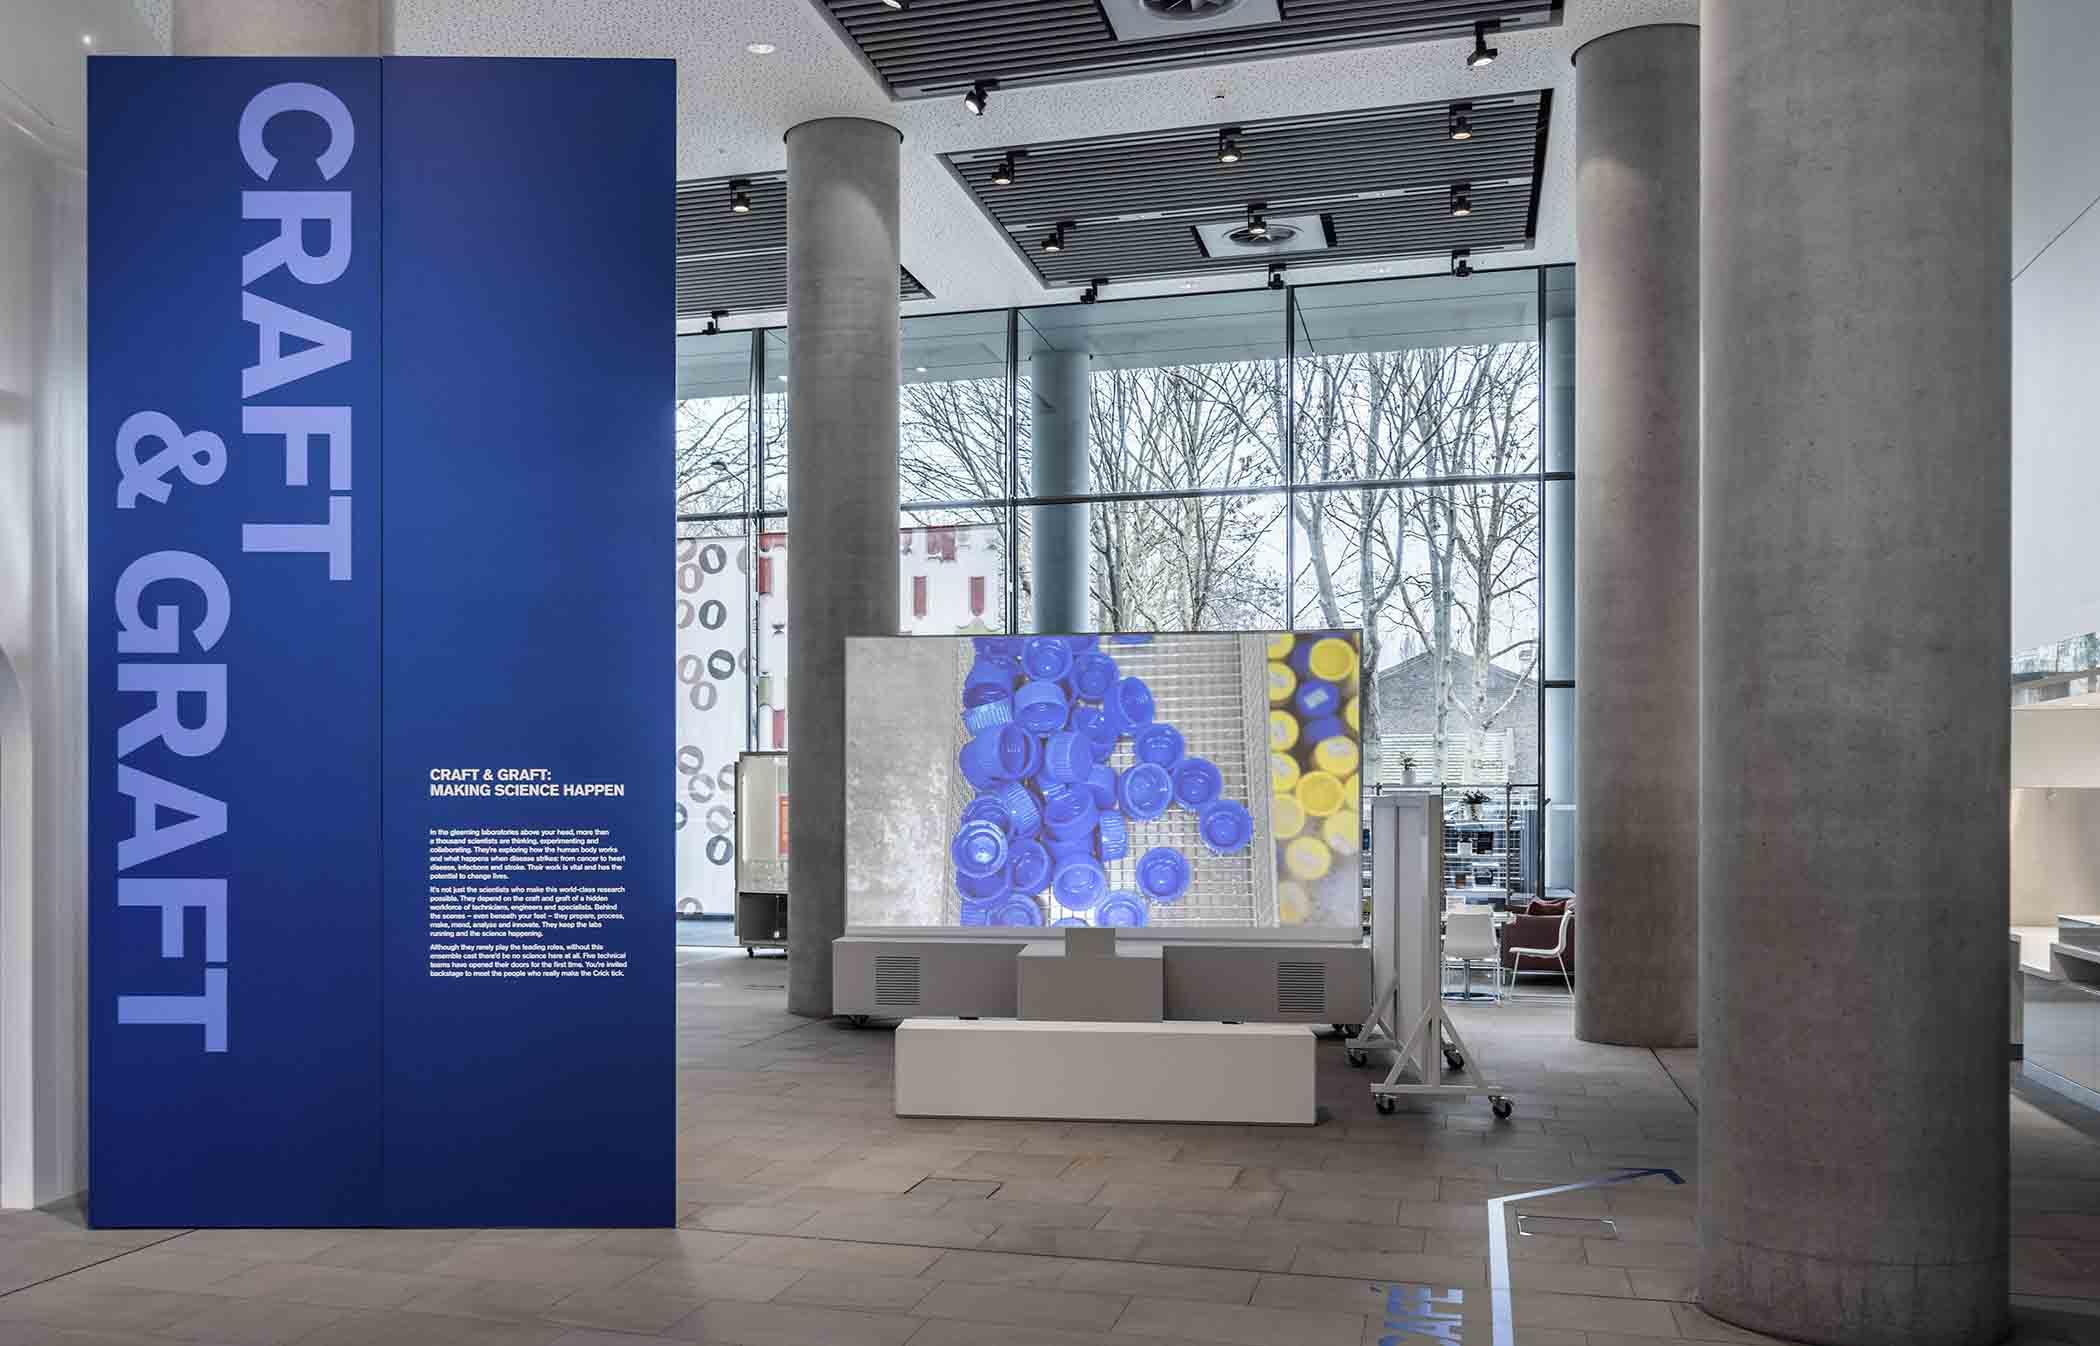 Francis Crick's Institute Craft & Graft: Making Science Happen